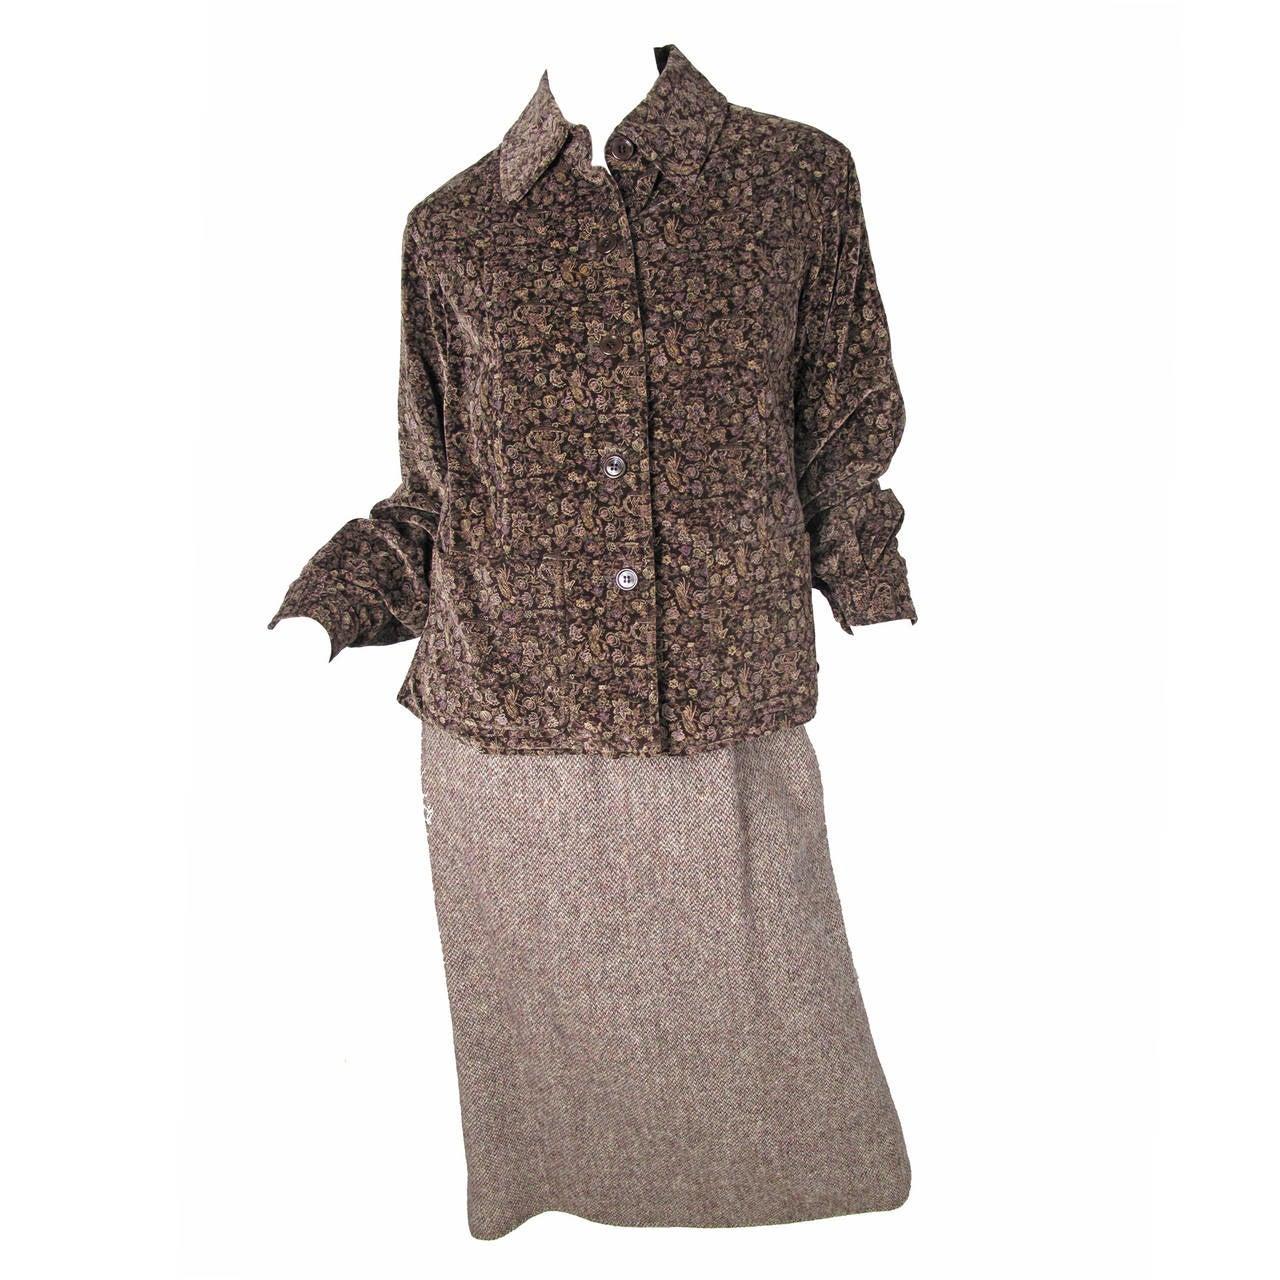 1970s Oscar de la Renta Velvet Jacket and Wool Skirt For Sale